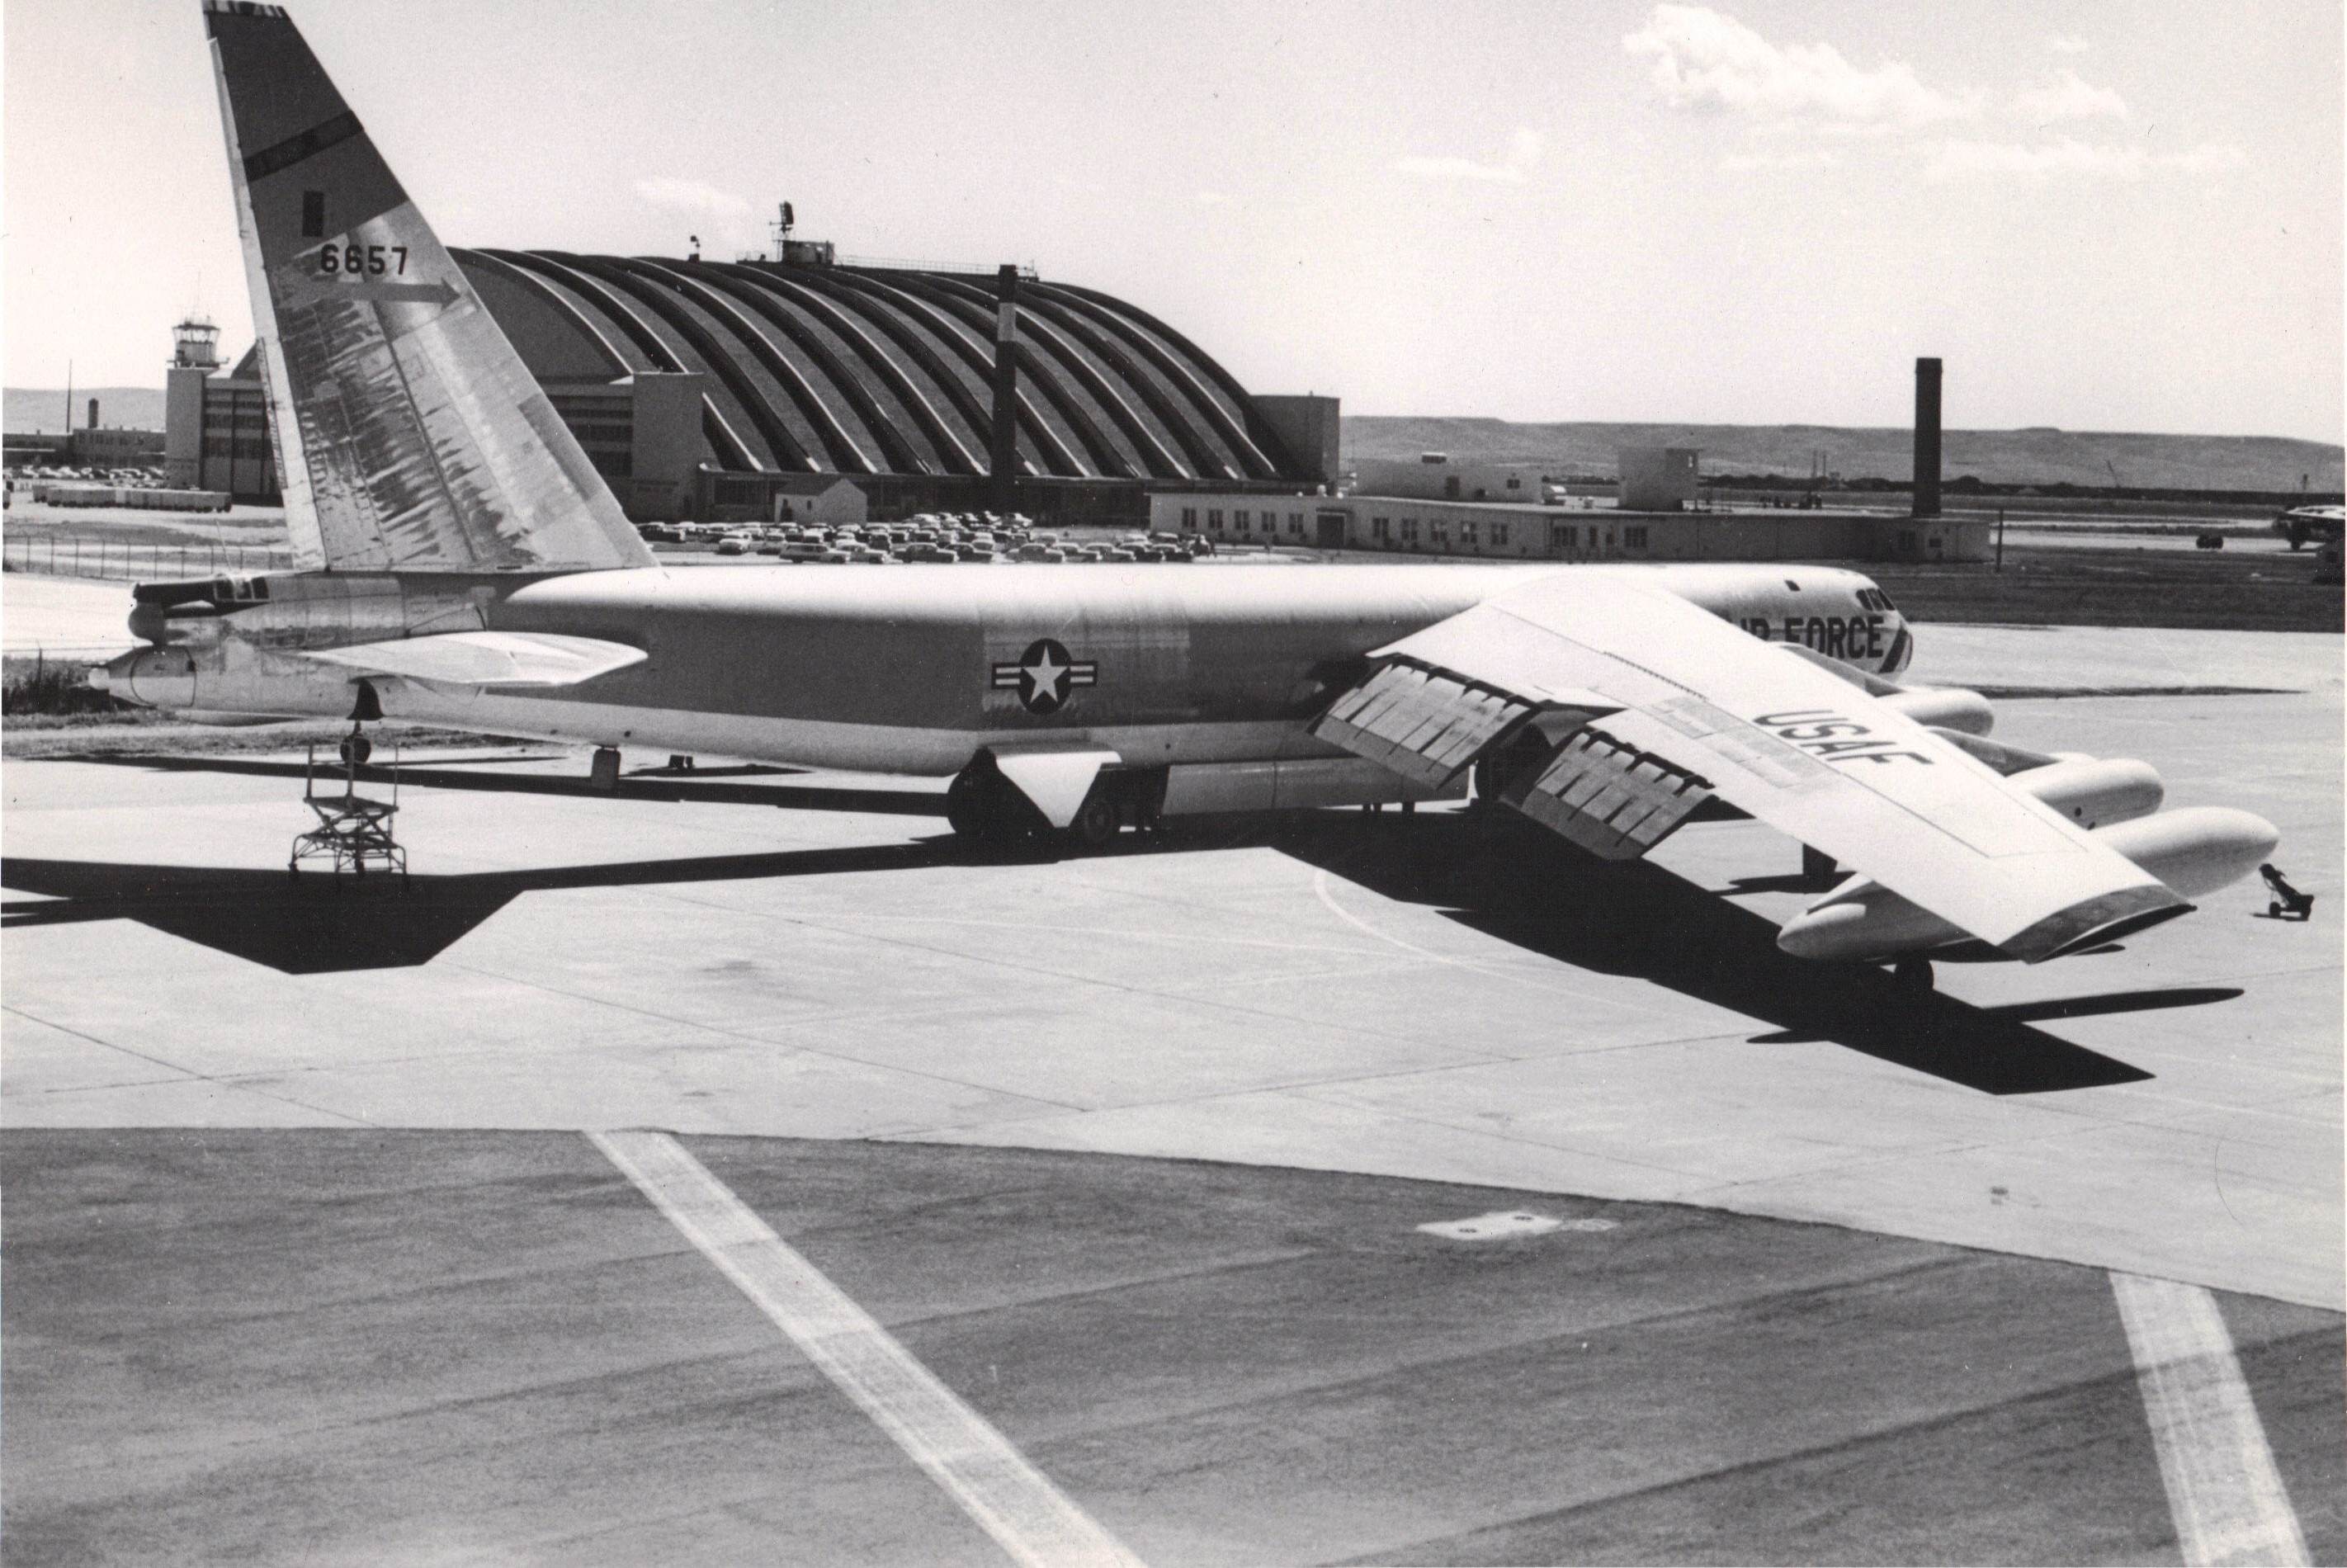 Image - 12.5) B-52D 56-0657 EAFB's first B-52, 1957 (USAF).jpg